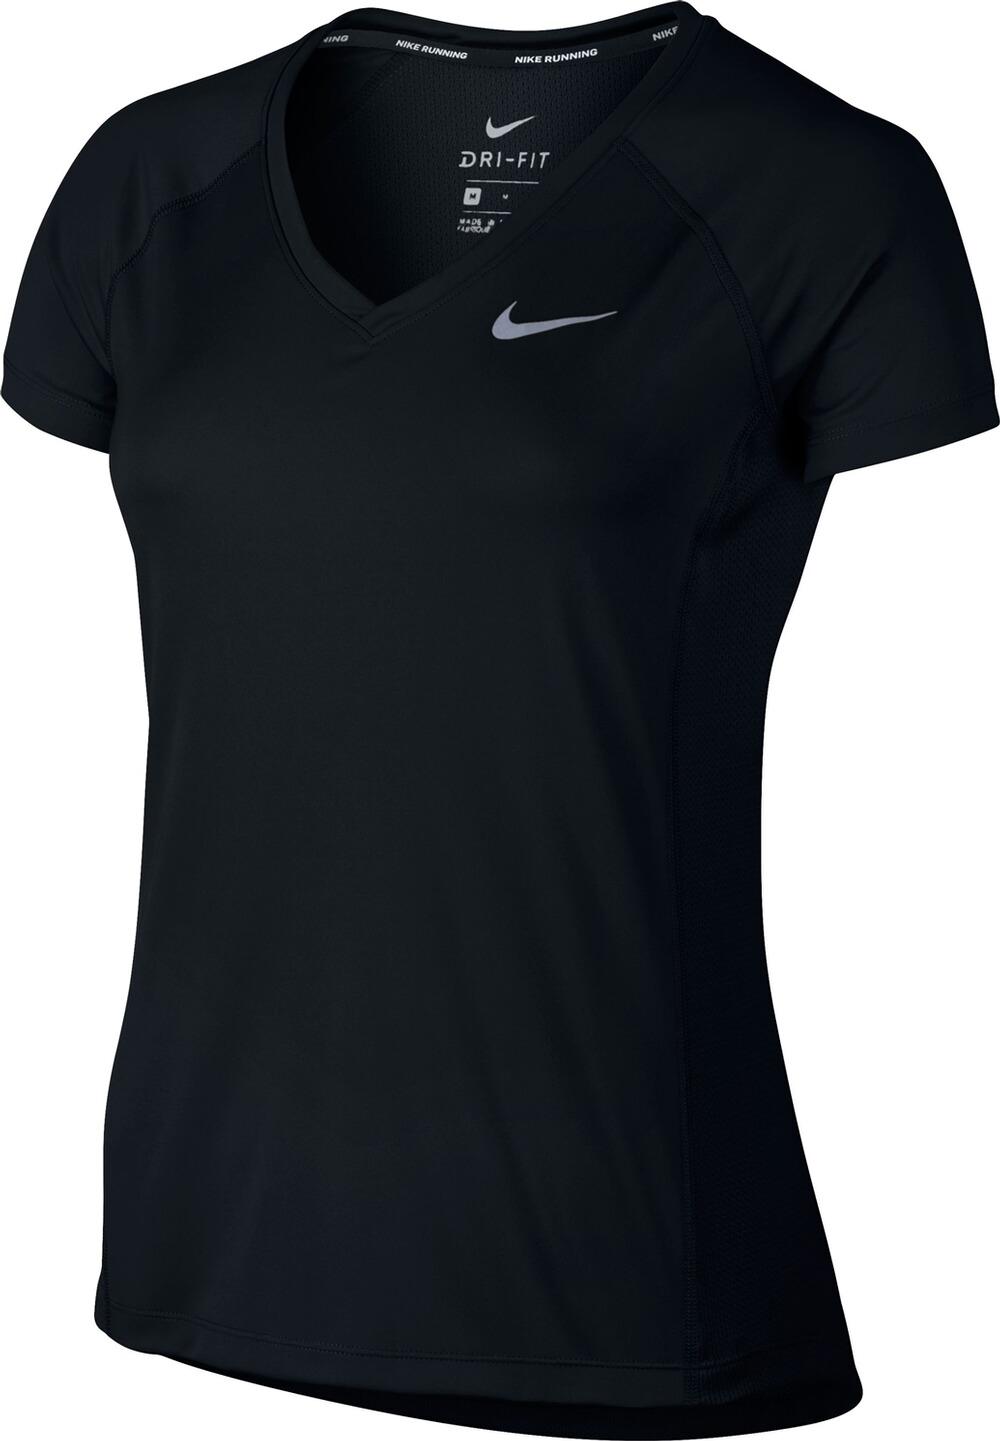 on feet images of sleek low price Details zu Nike Damen Laufshirt Sportshirt T-Shirt DRI-FIT MILER TOP V-NECK  schwarz